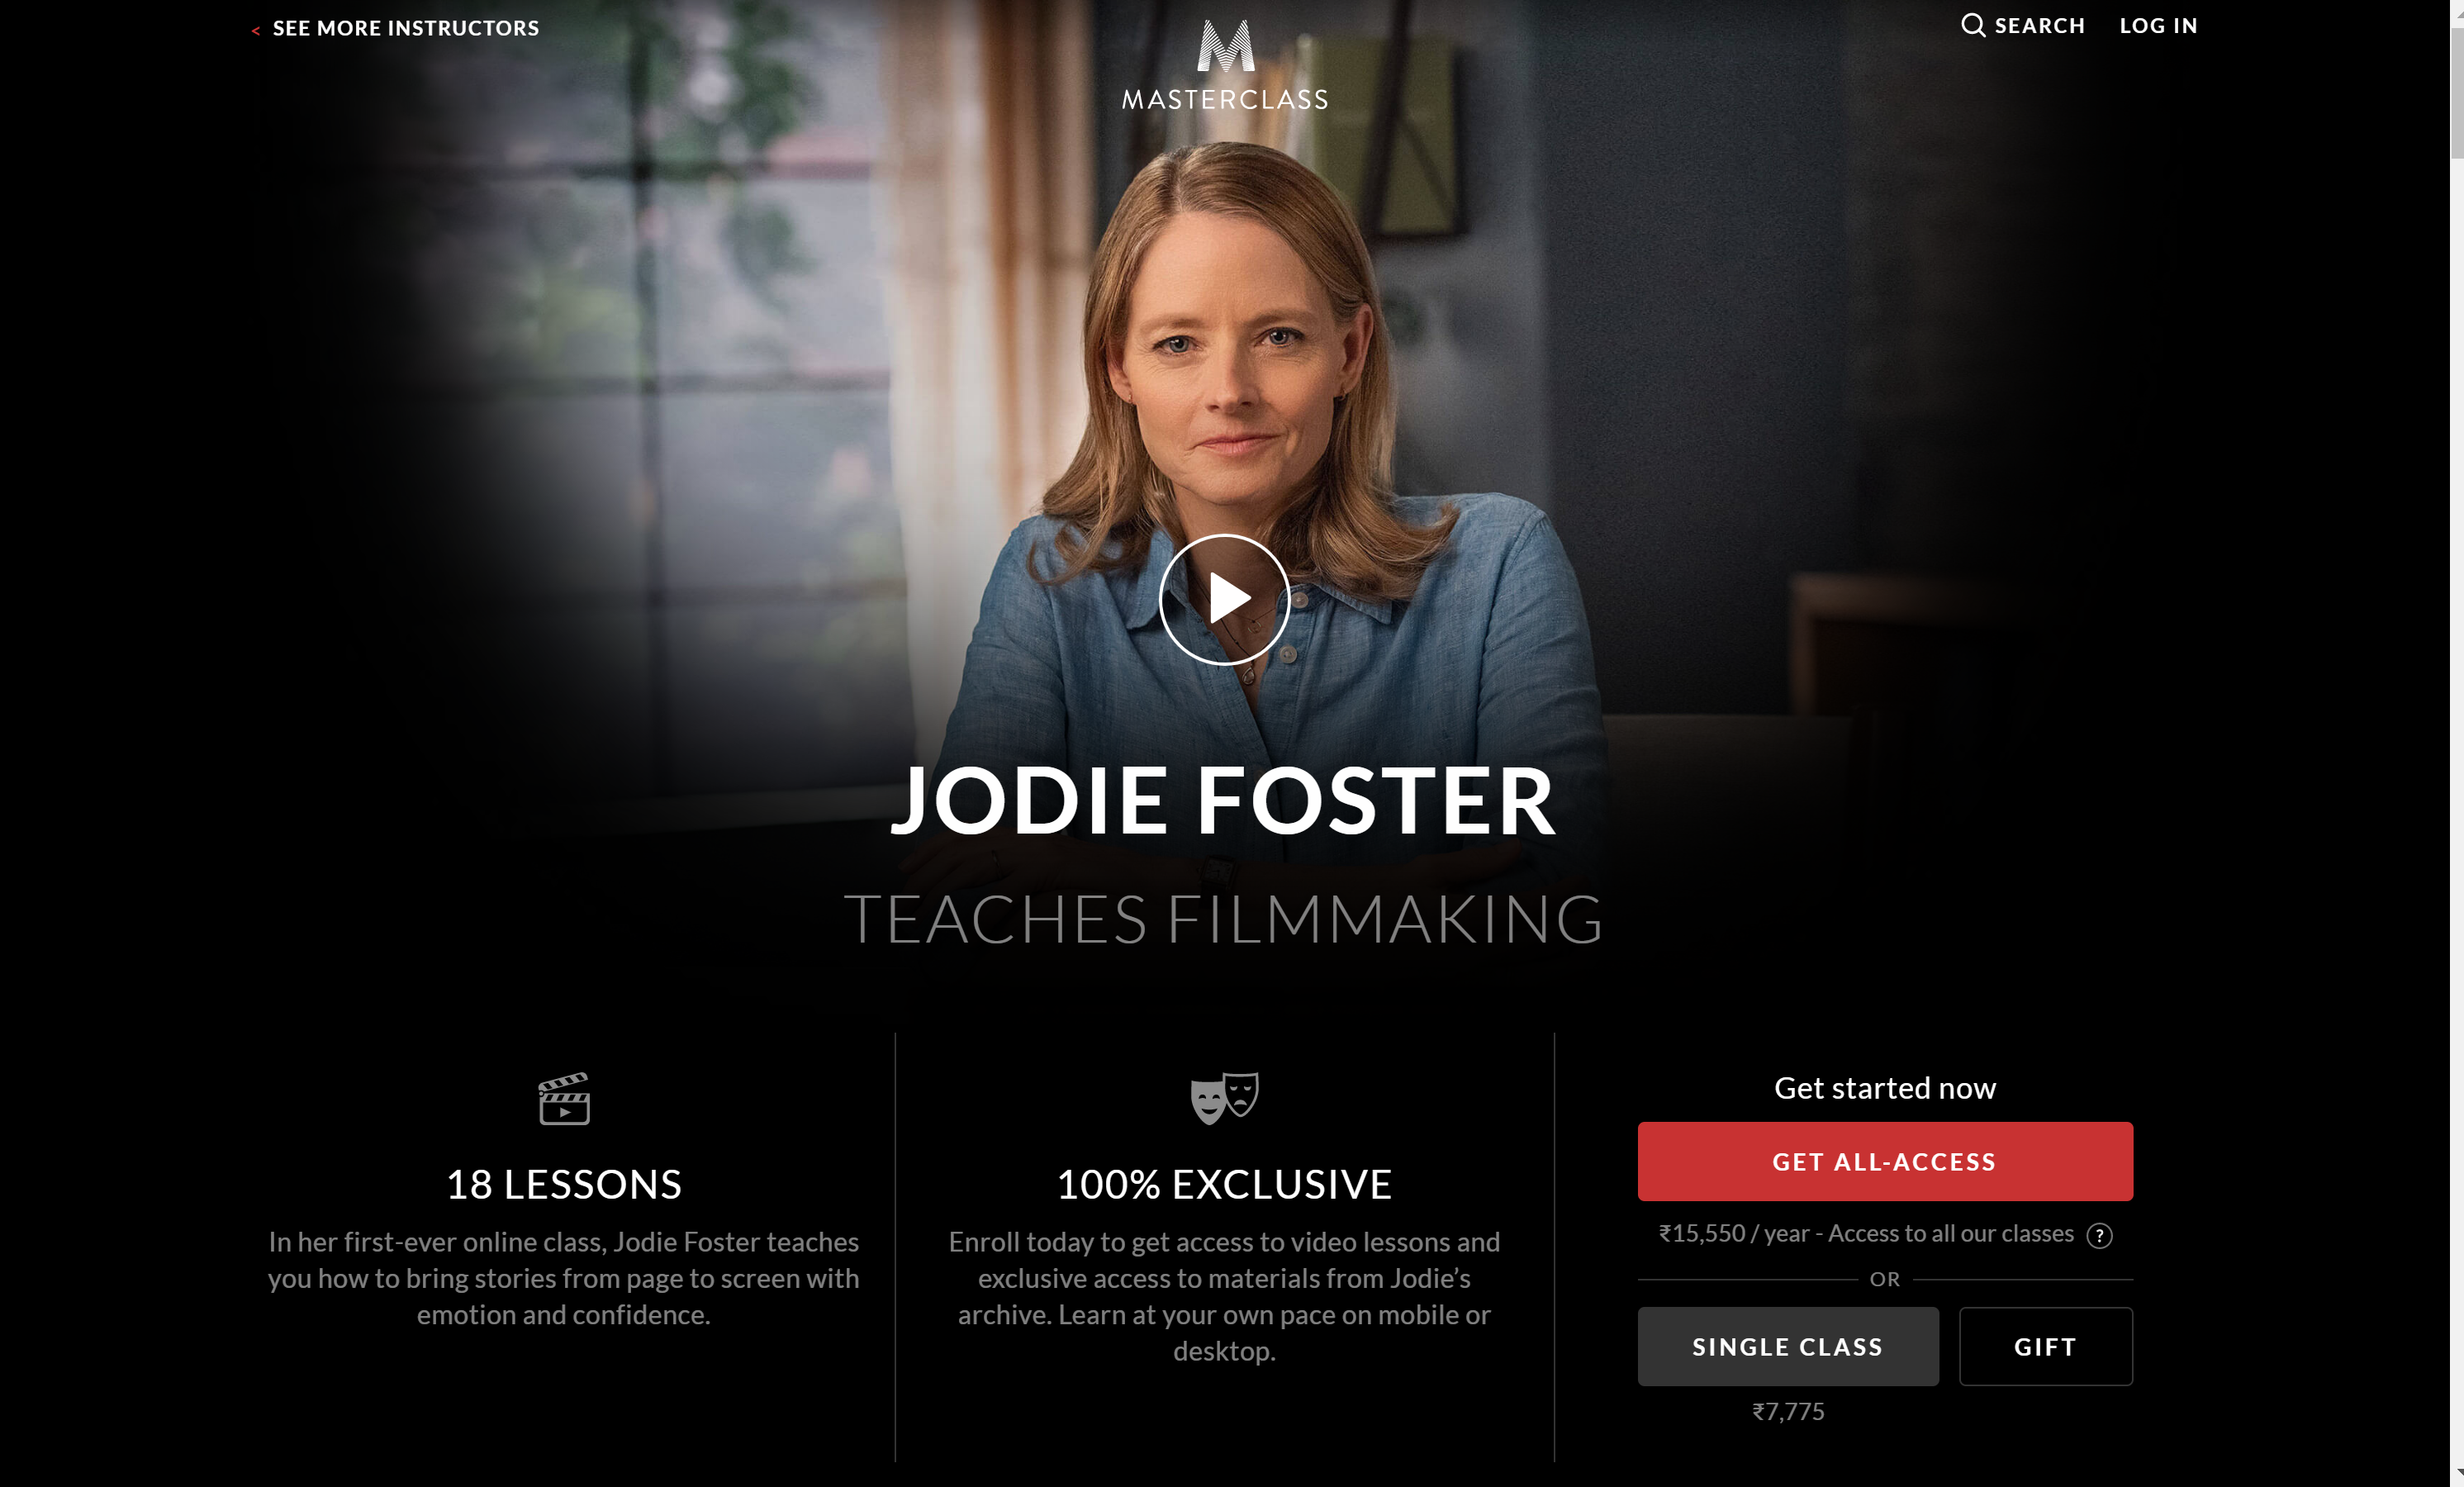 Jodie Foster FilmMaking Masterclass review